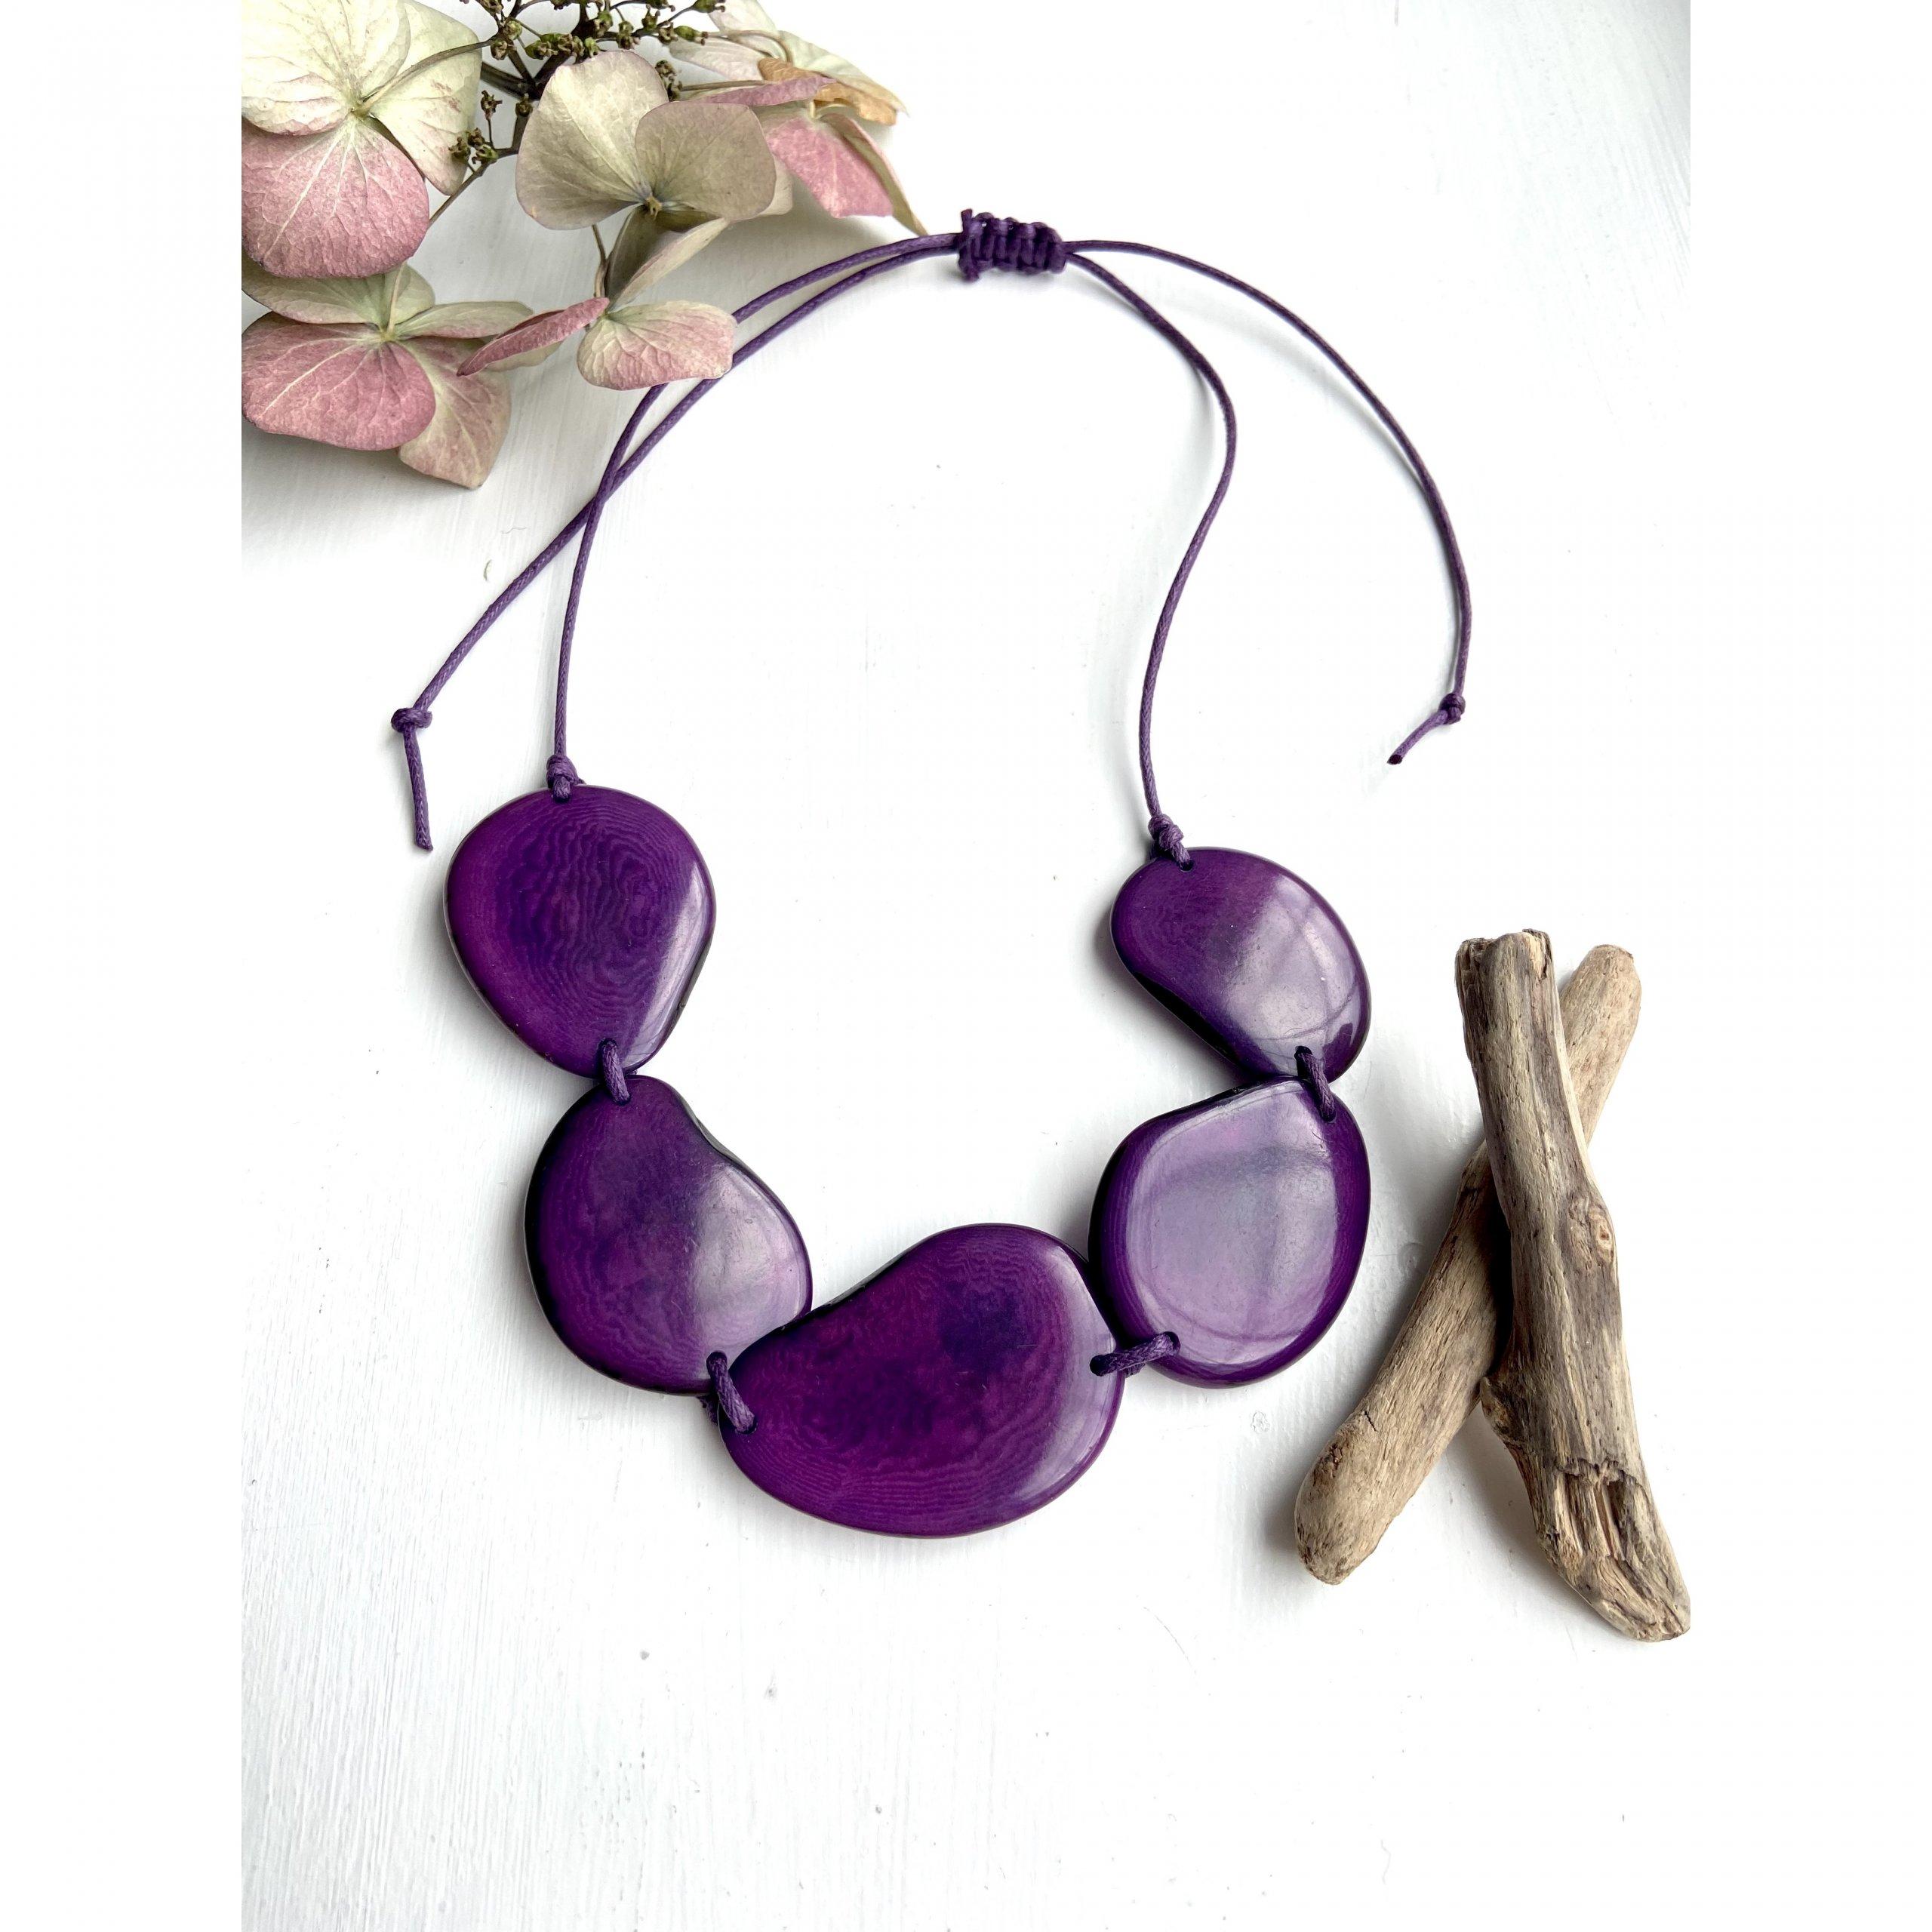 purple-tagua-jewellery-necklace-adjustable